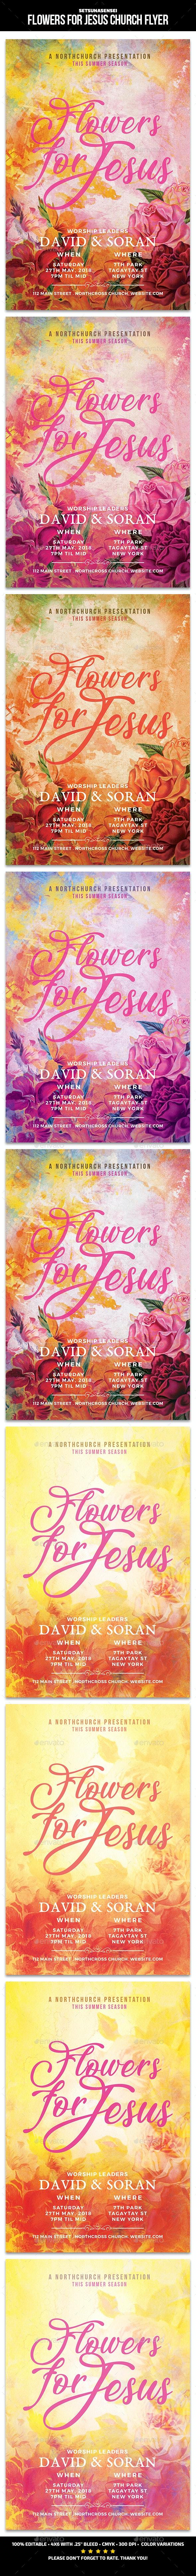 Flowers for Jesus Church Flyer - Church Flyers